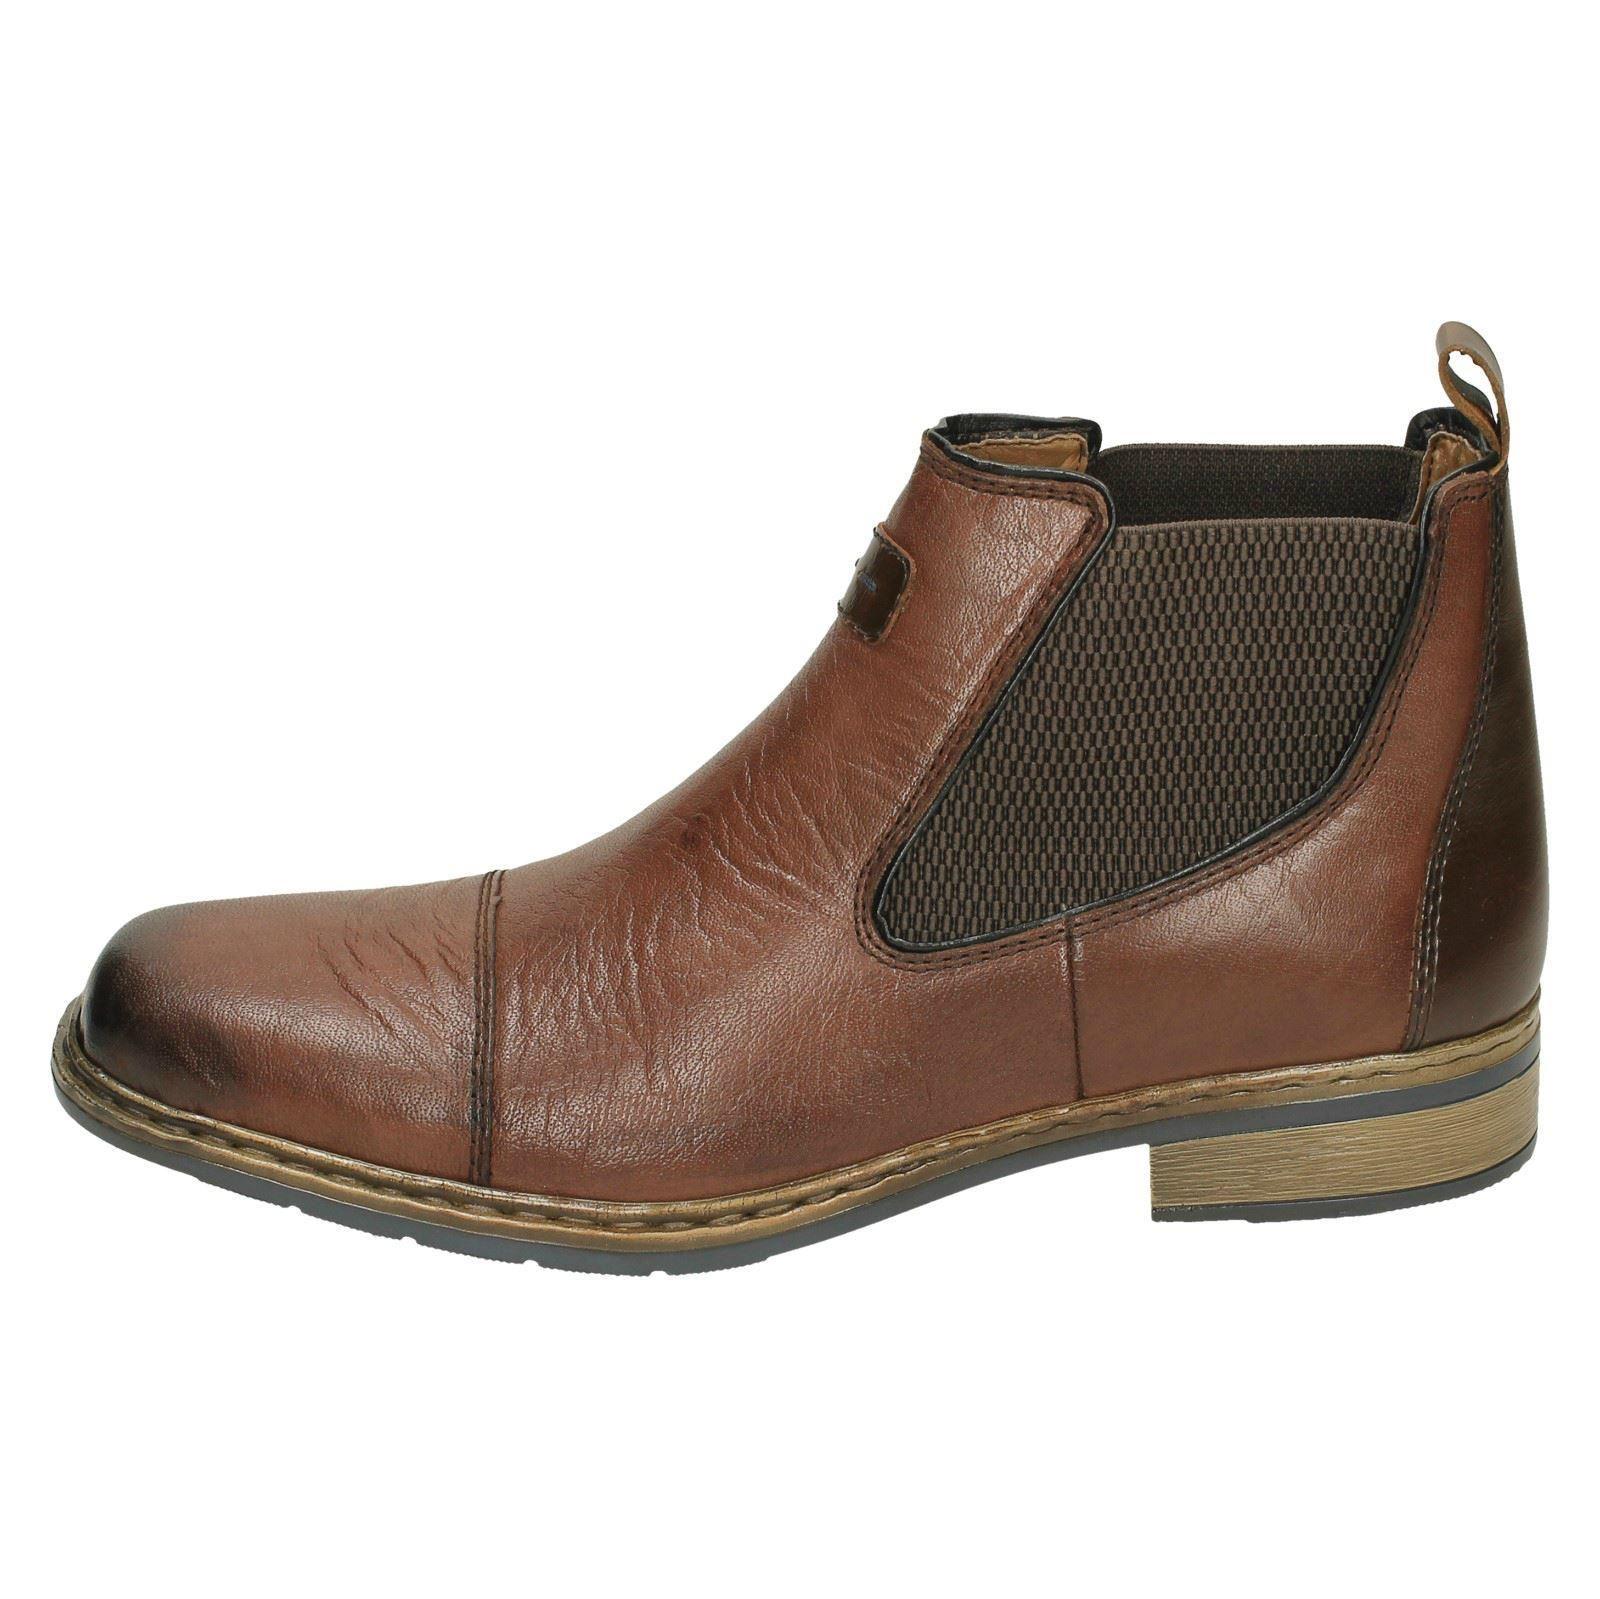 30863 Marrone Mens Boots Chelsea Rieker qO7aTtS